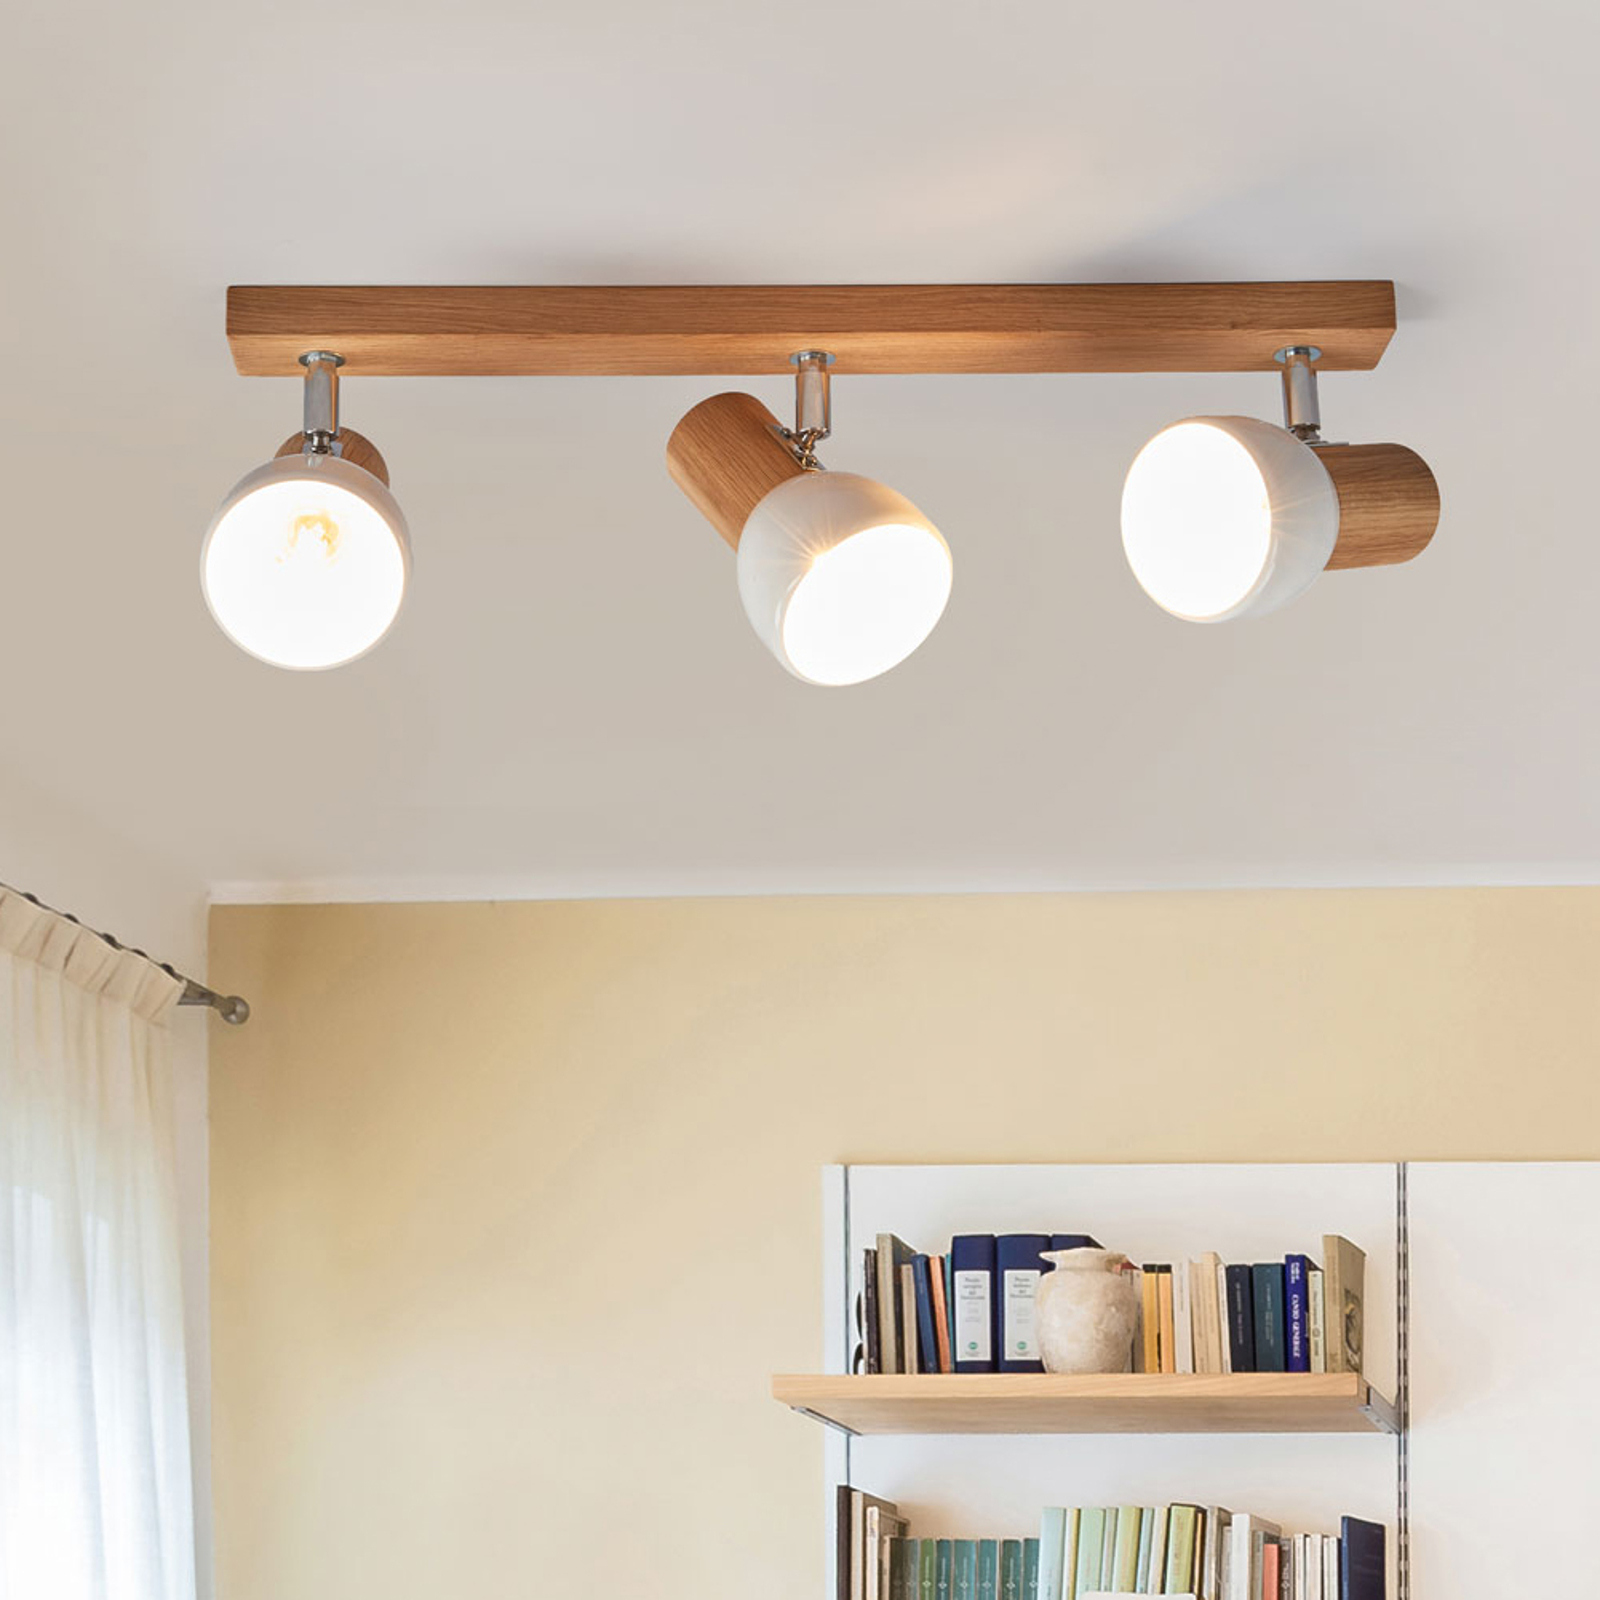 Svenda - Taklampe i tre, tre lys